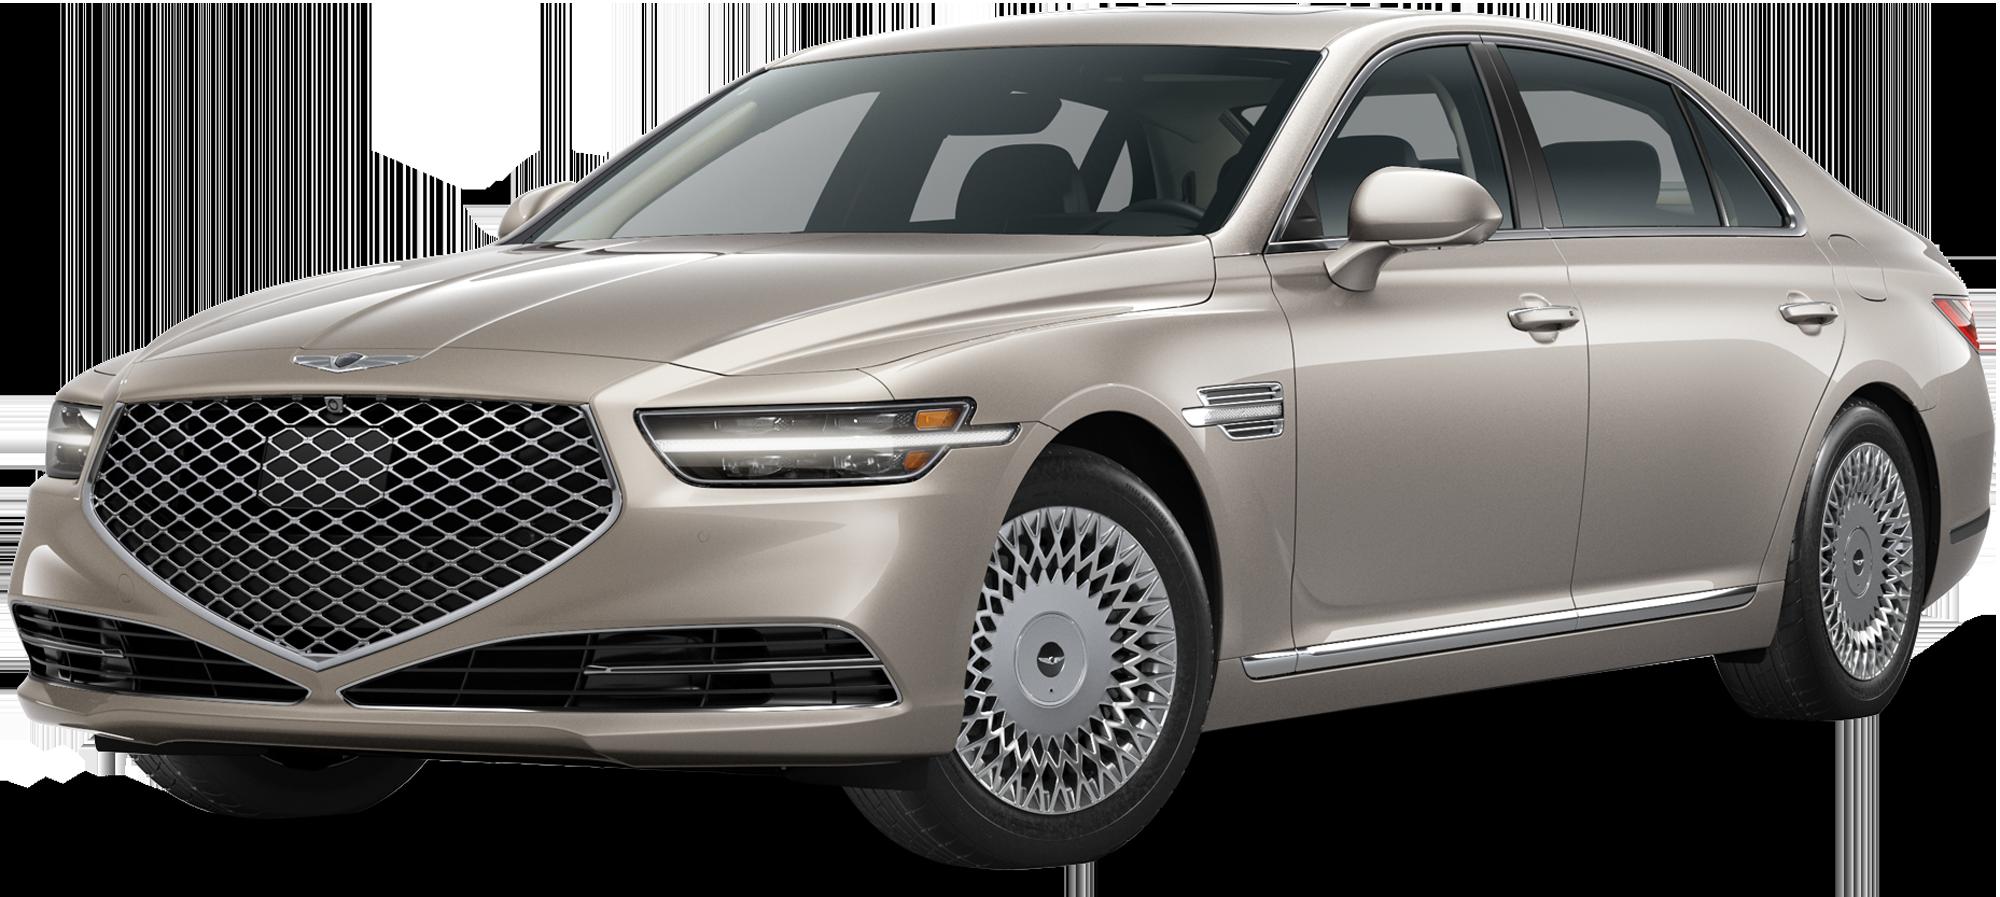 2020 Genesis G90 Sedan 3.3T Premium